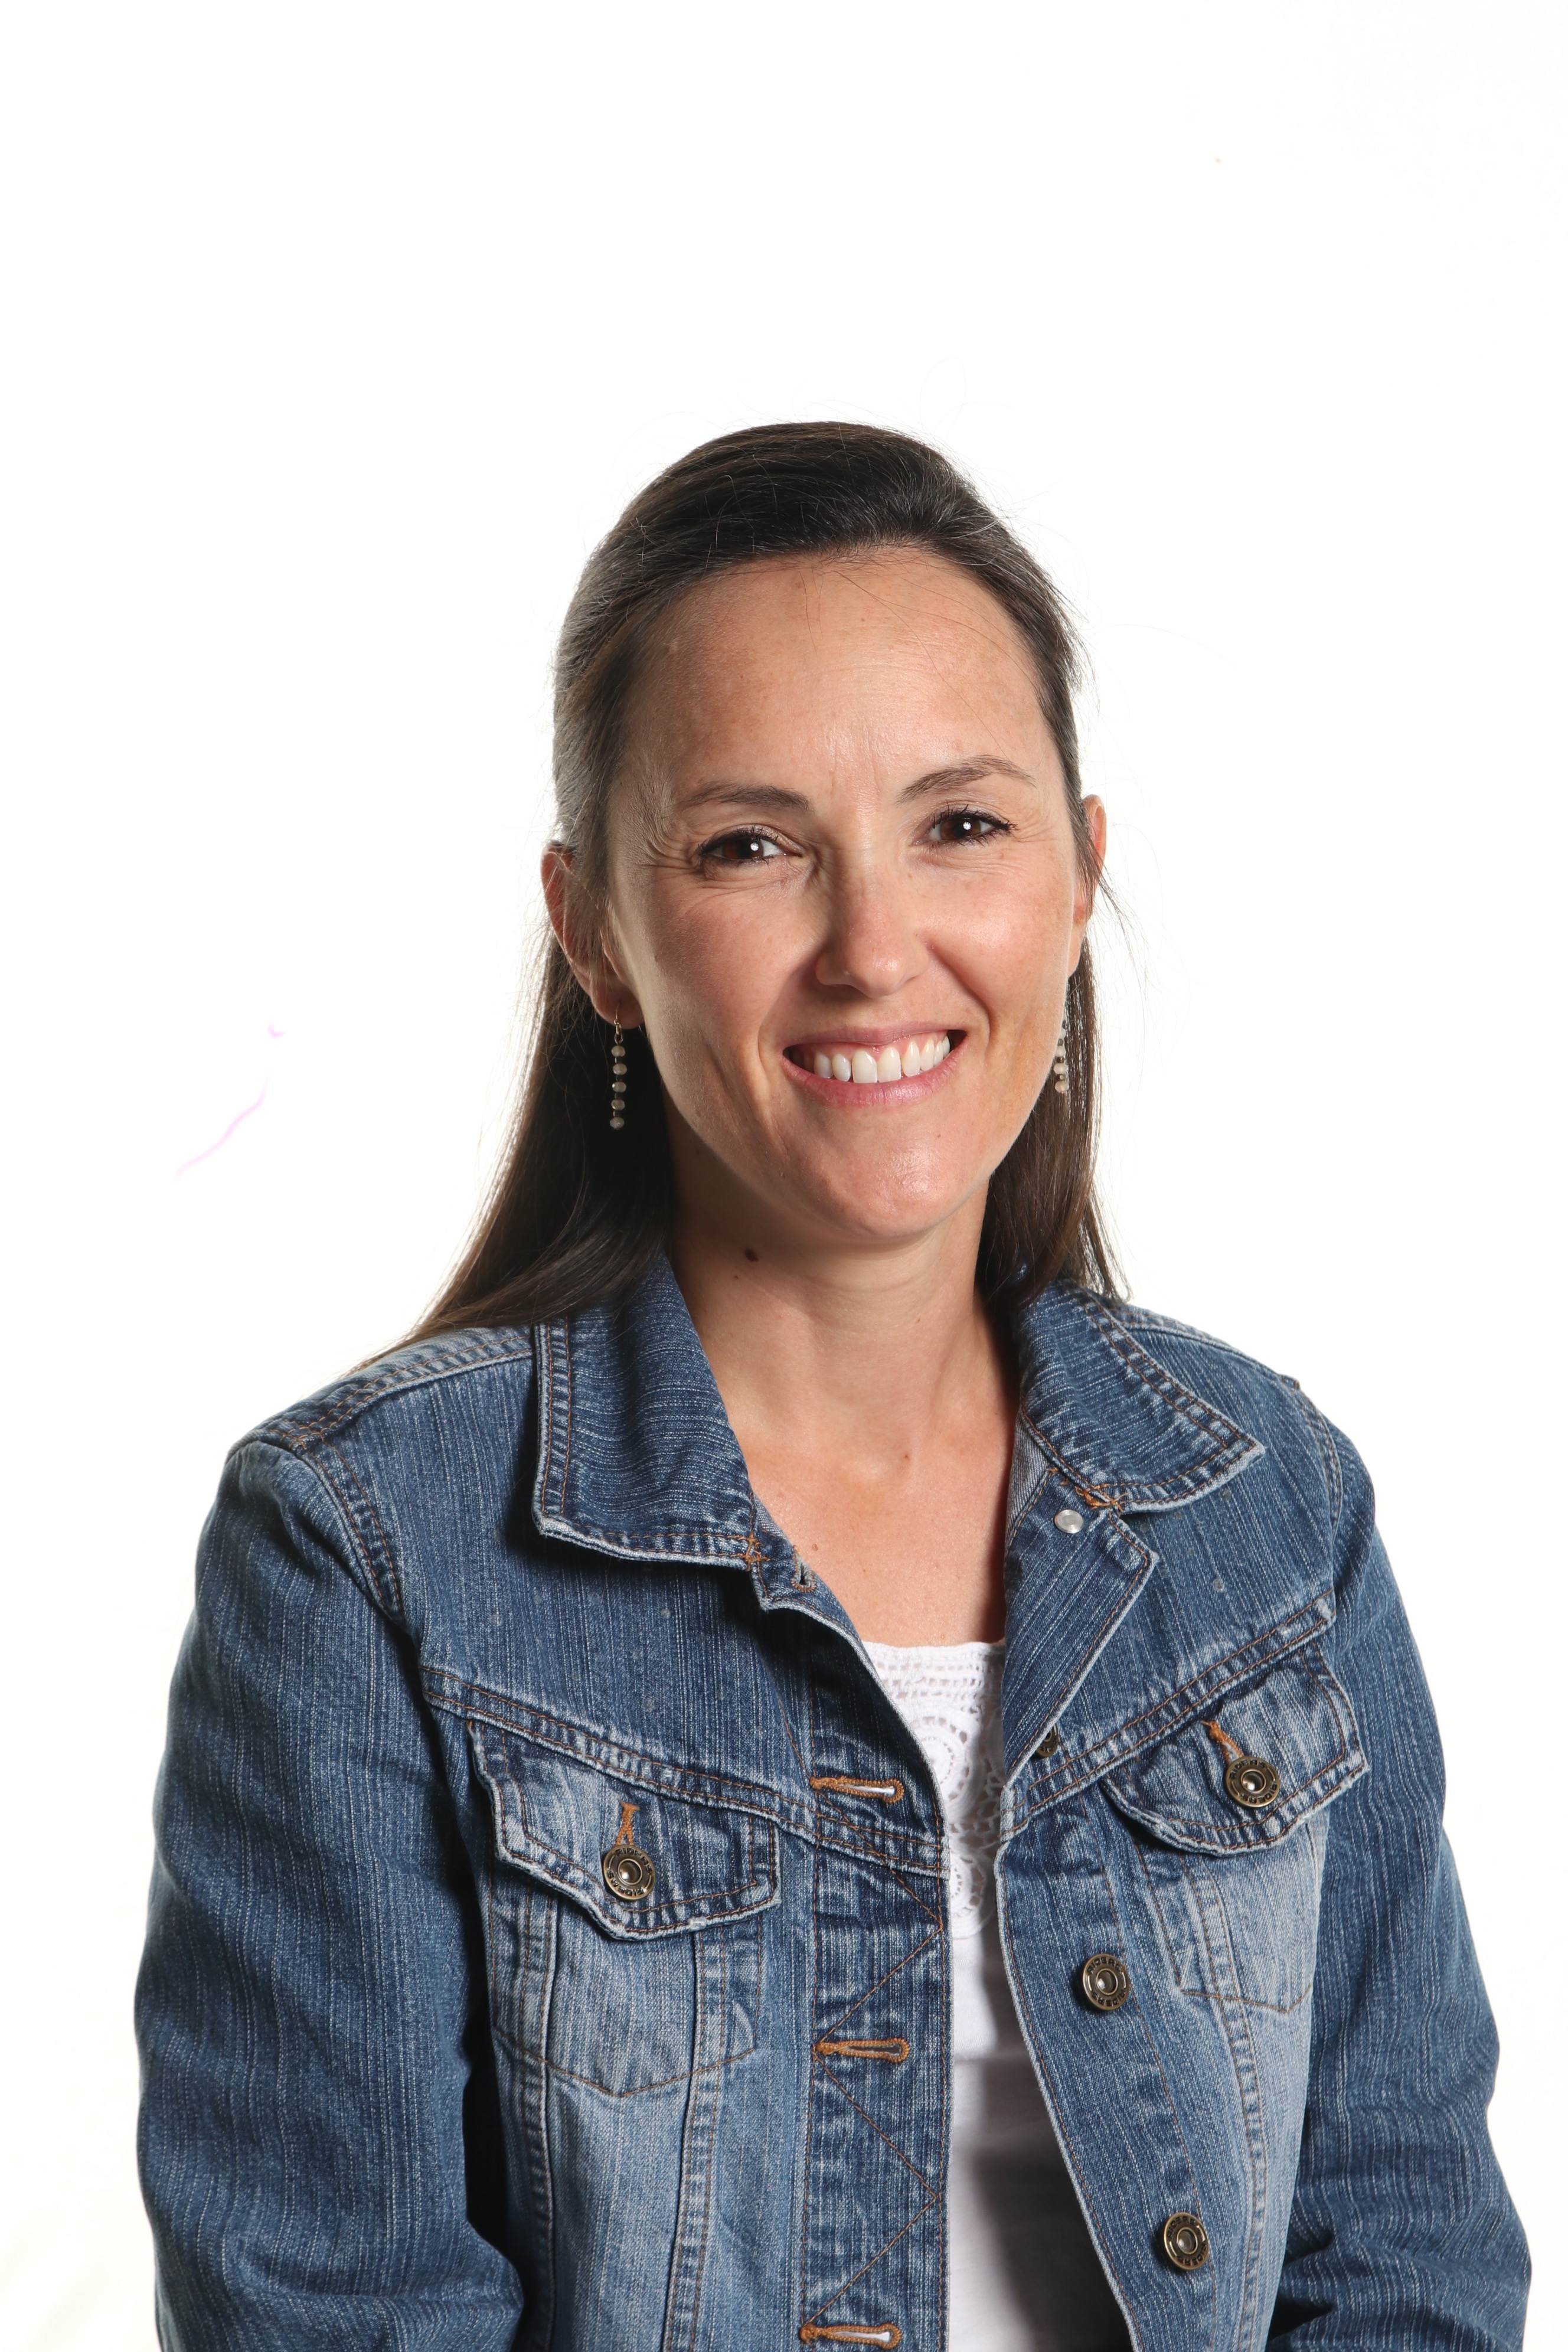 Nicole Sutherland